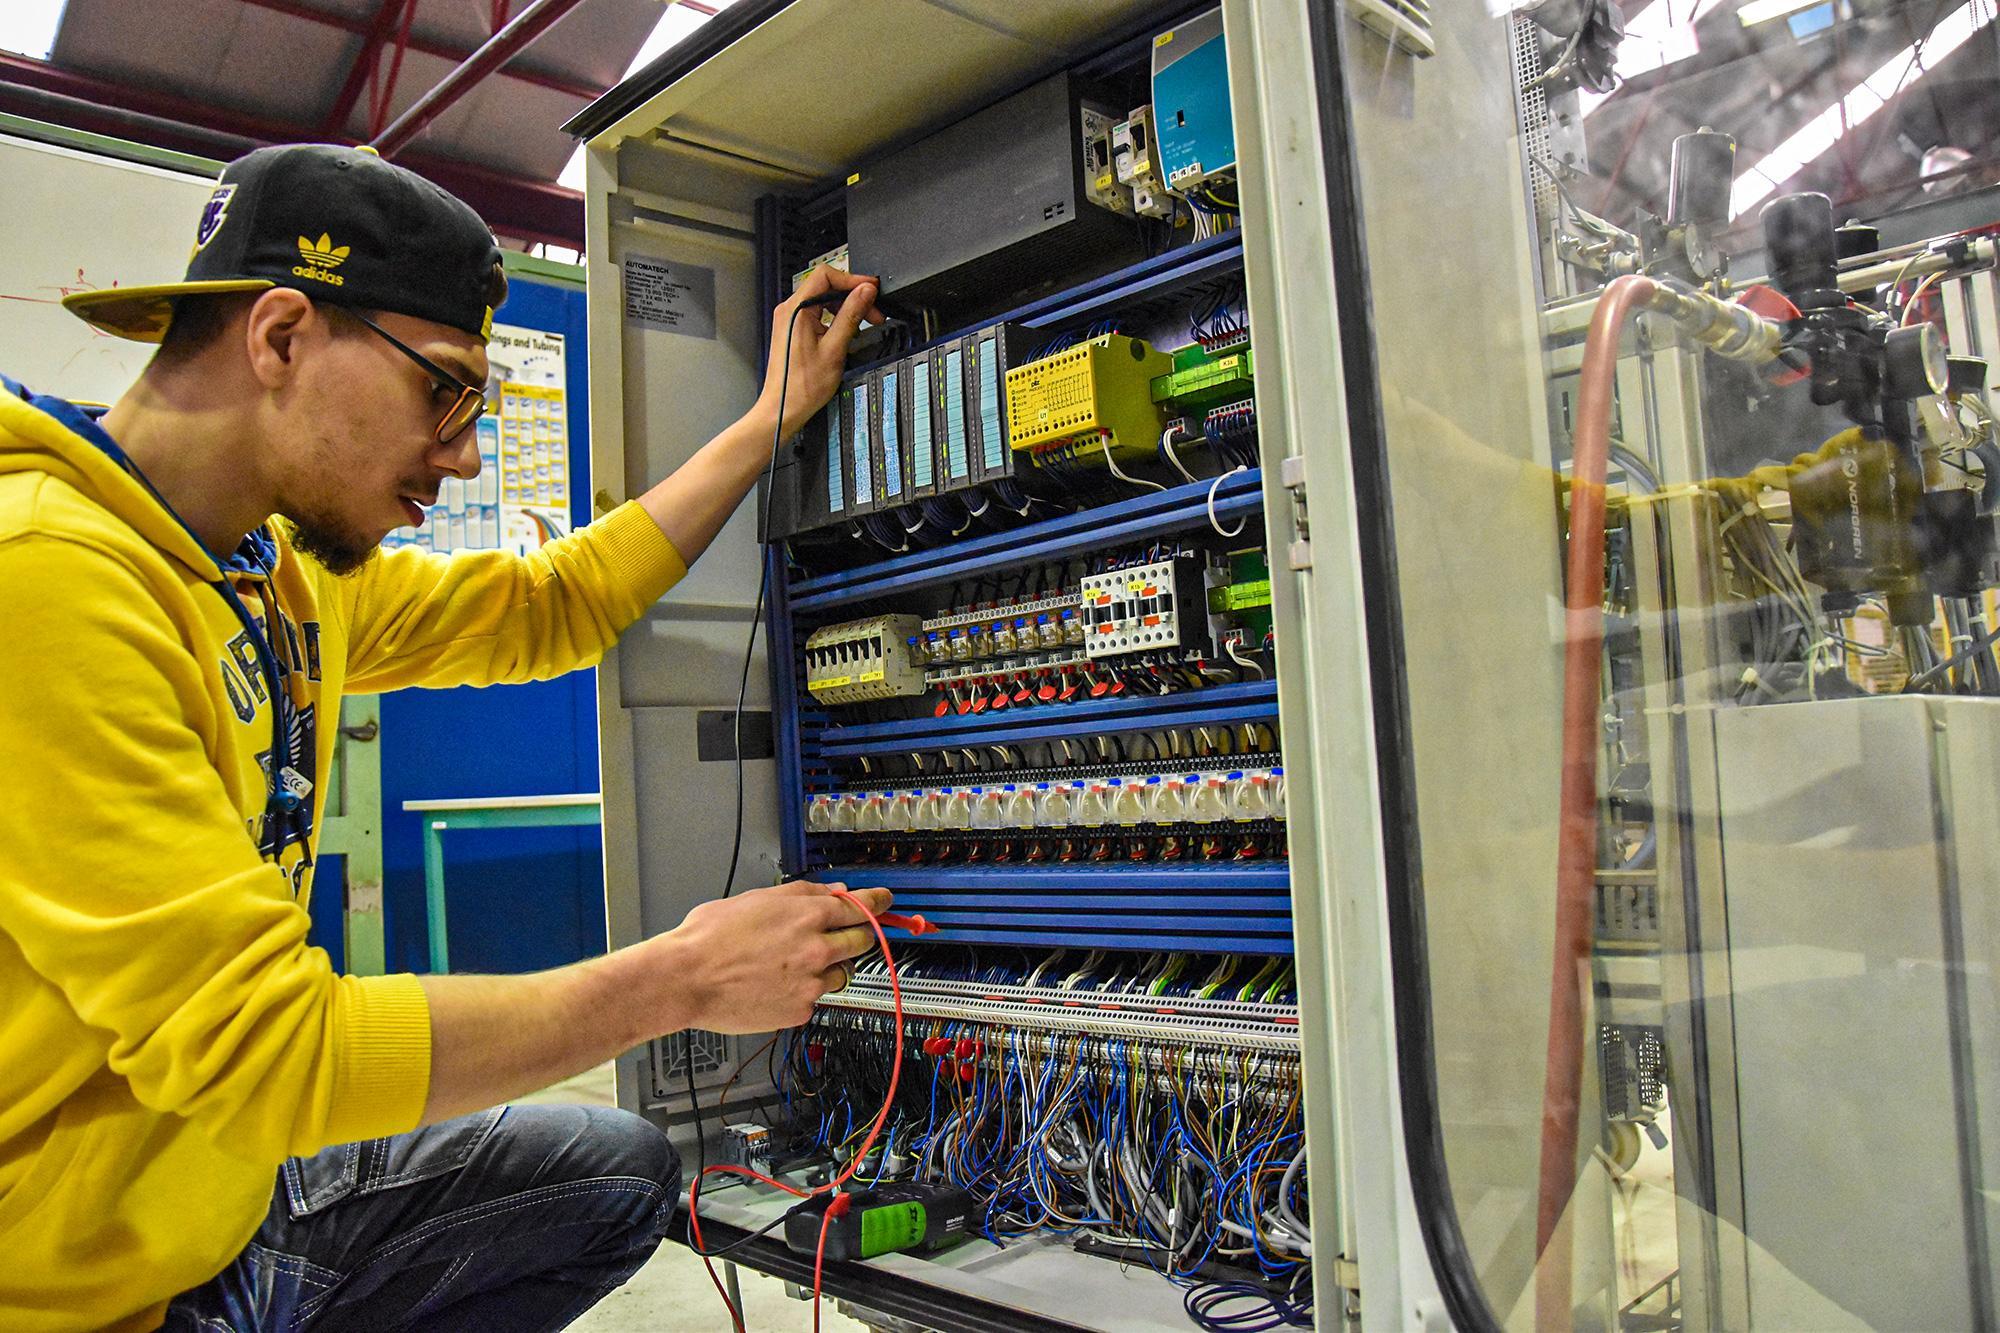 Elektriciteit - basisprincipes